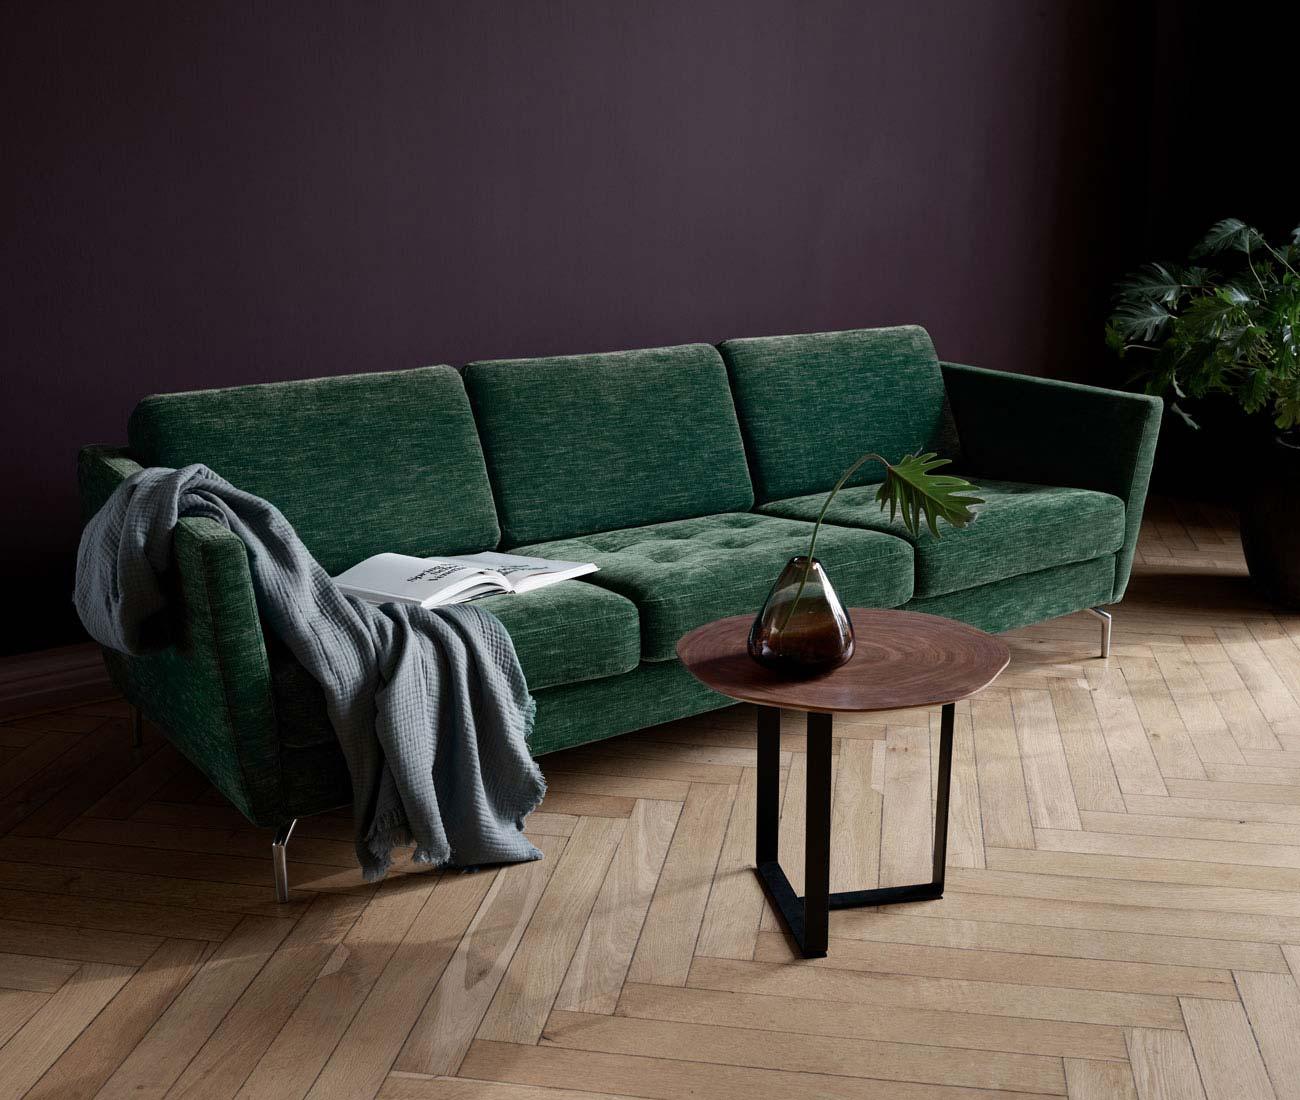 3 seater designer sofa by BoConcept